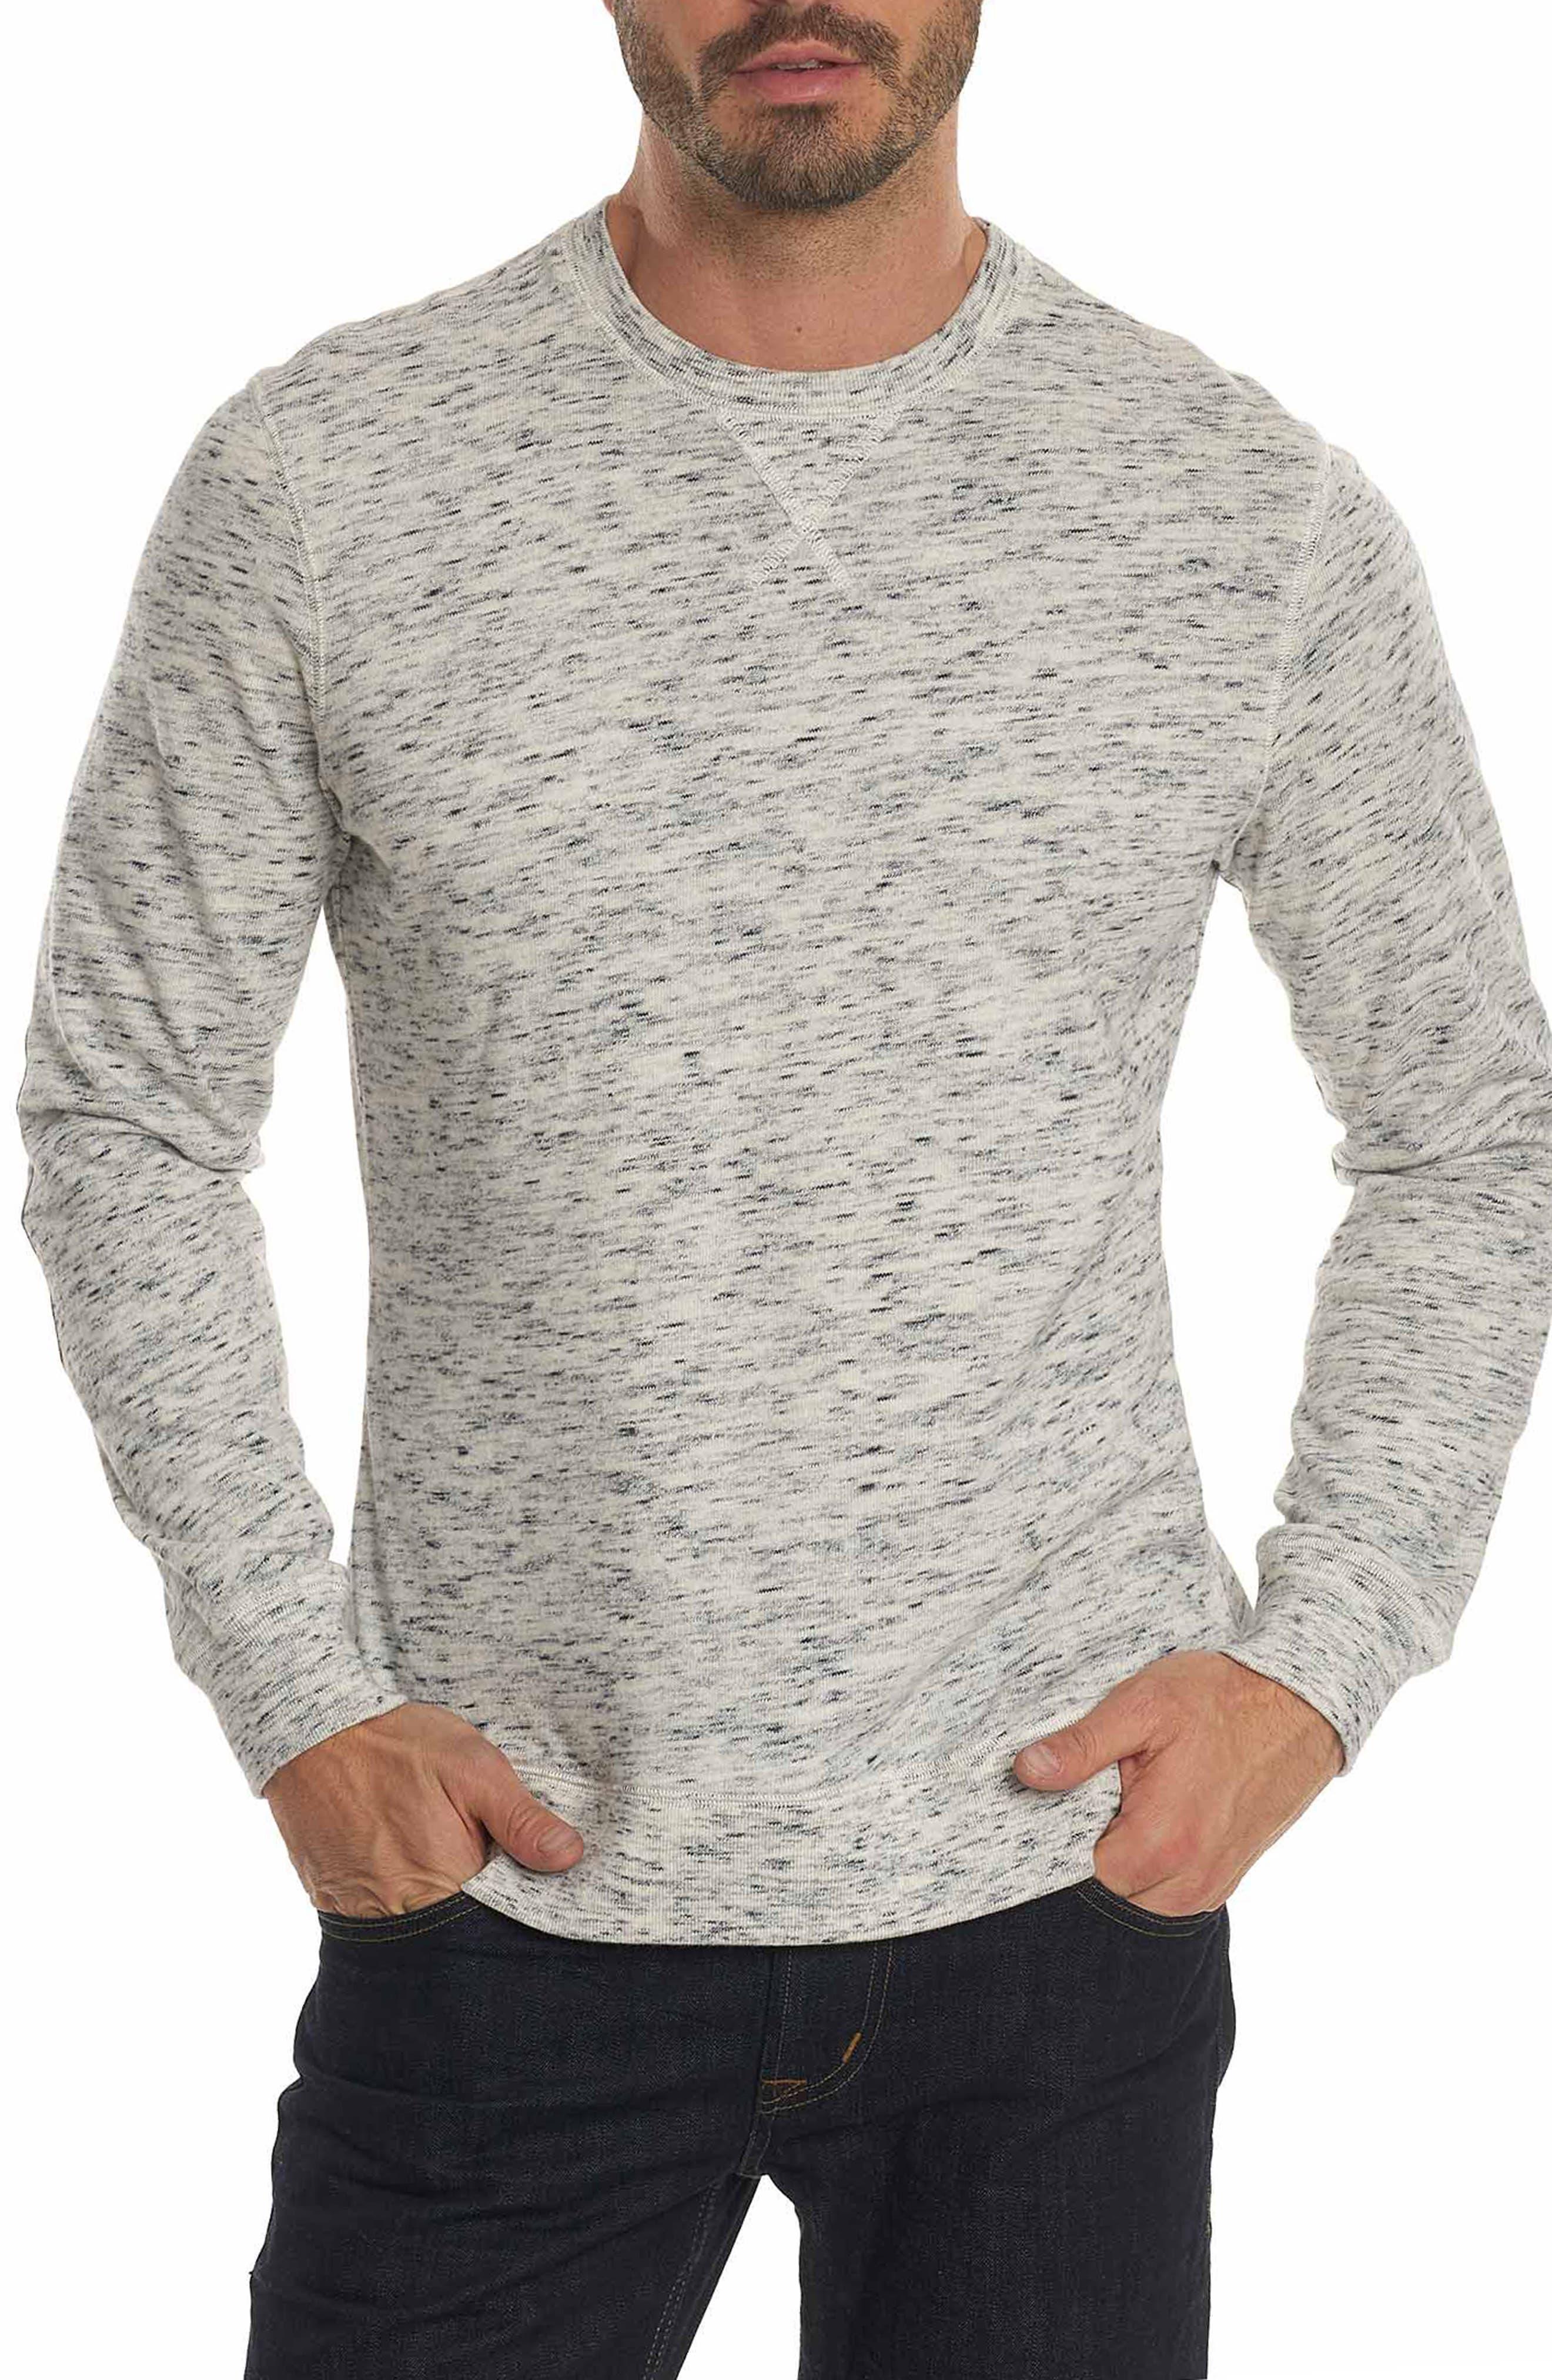 Endurance Elbow Patch Sweatshirt,                             Main thumbnail 1, color,